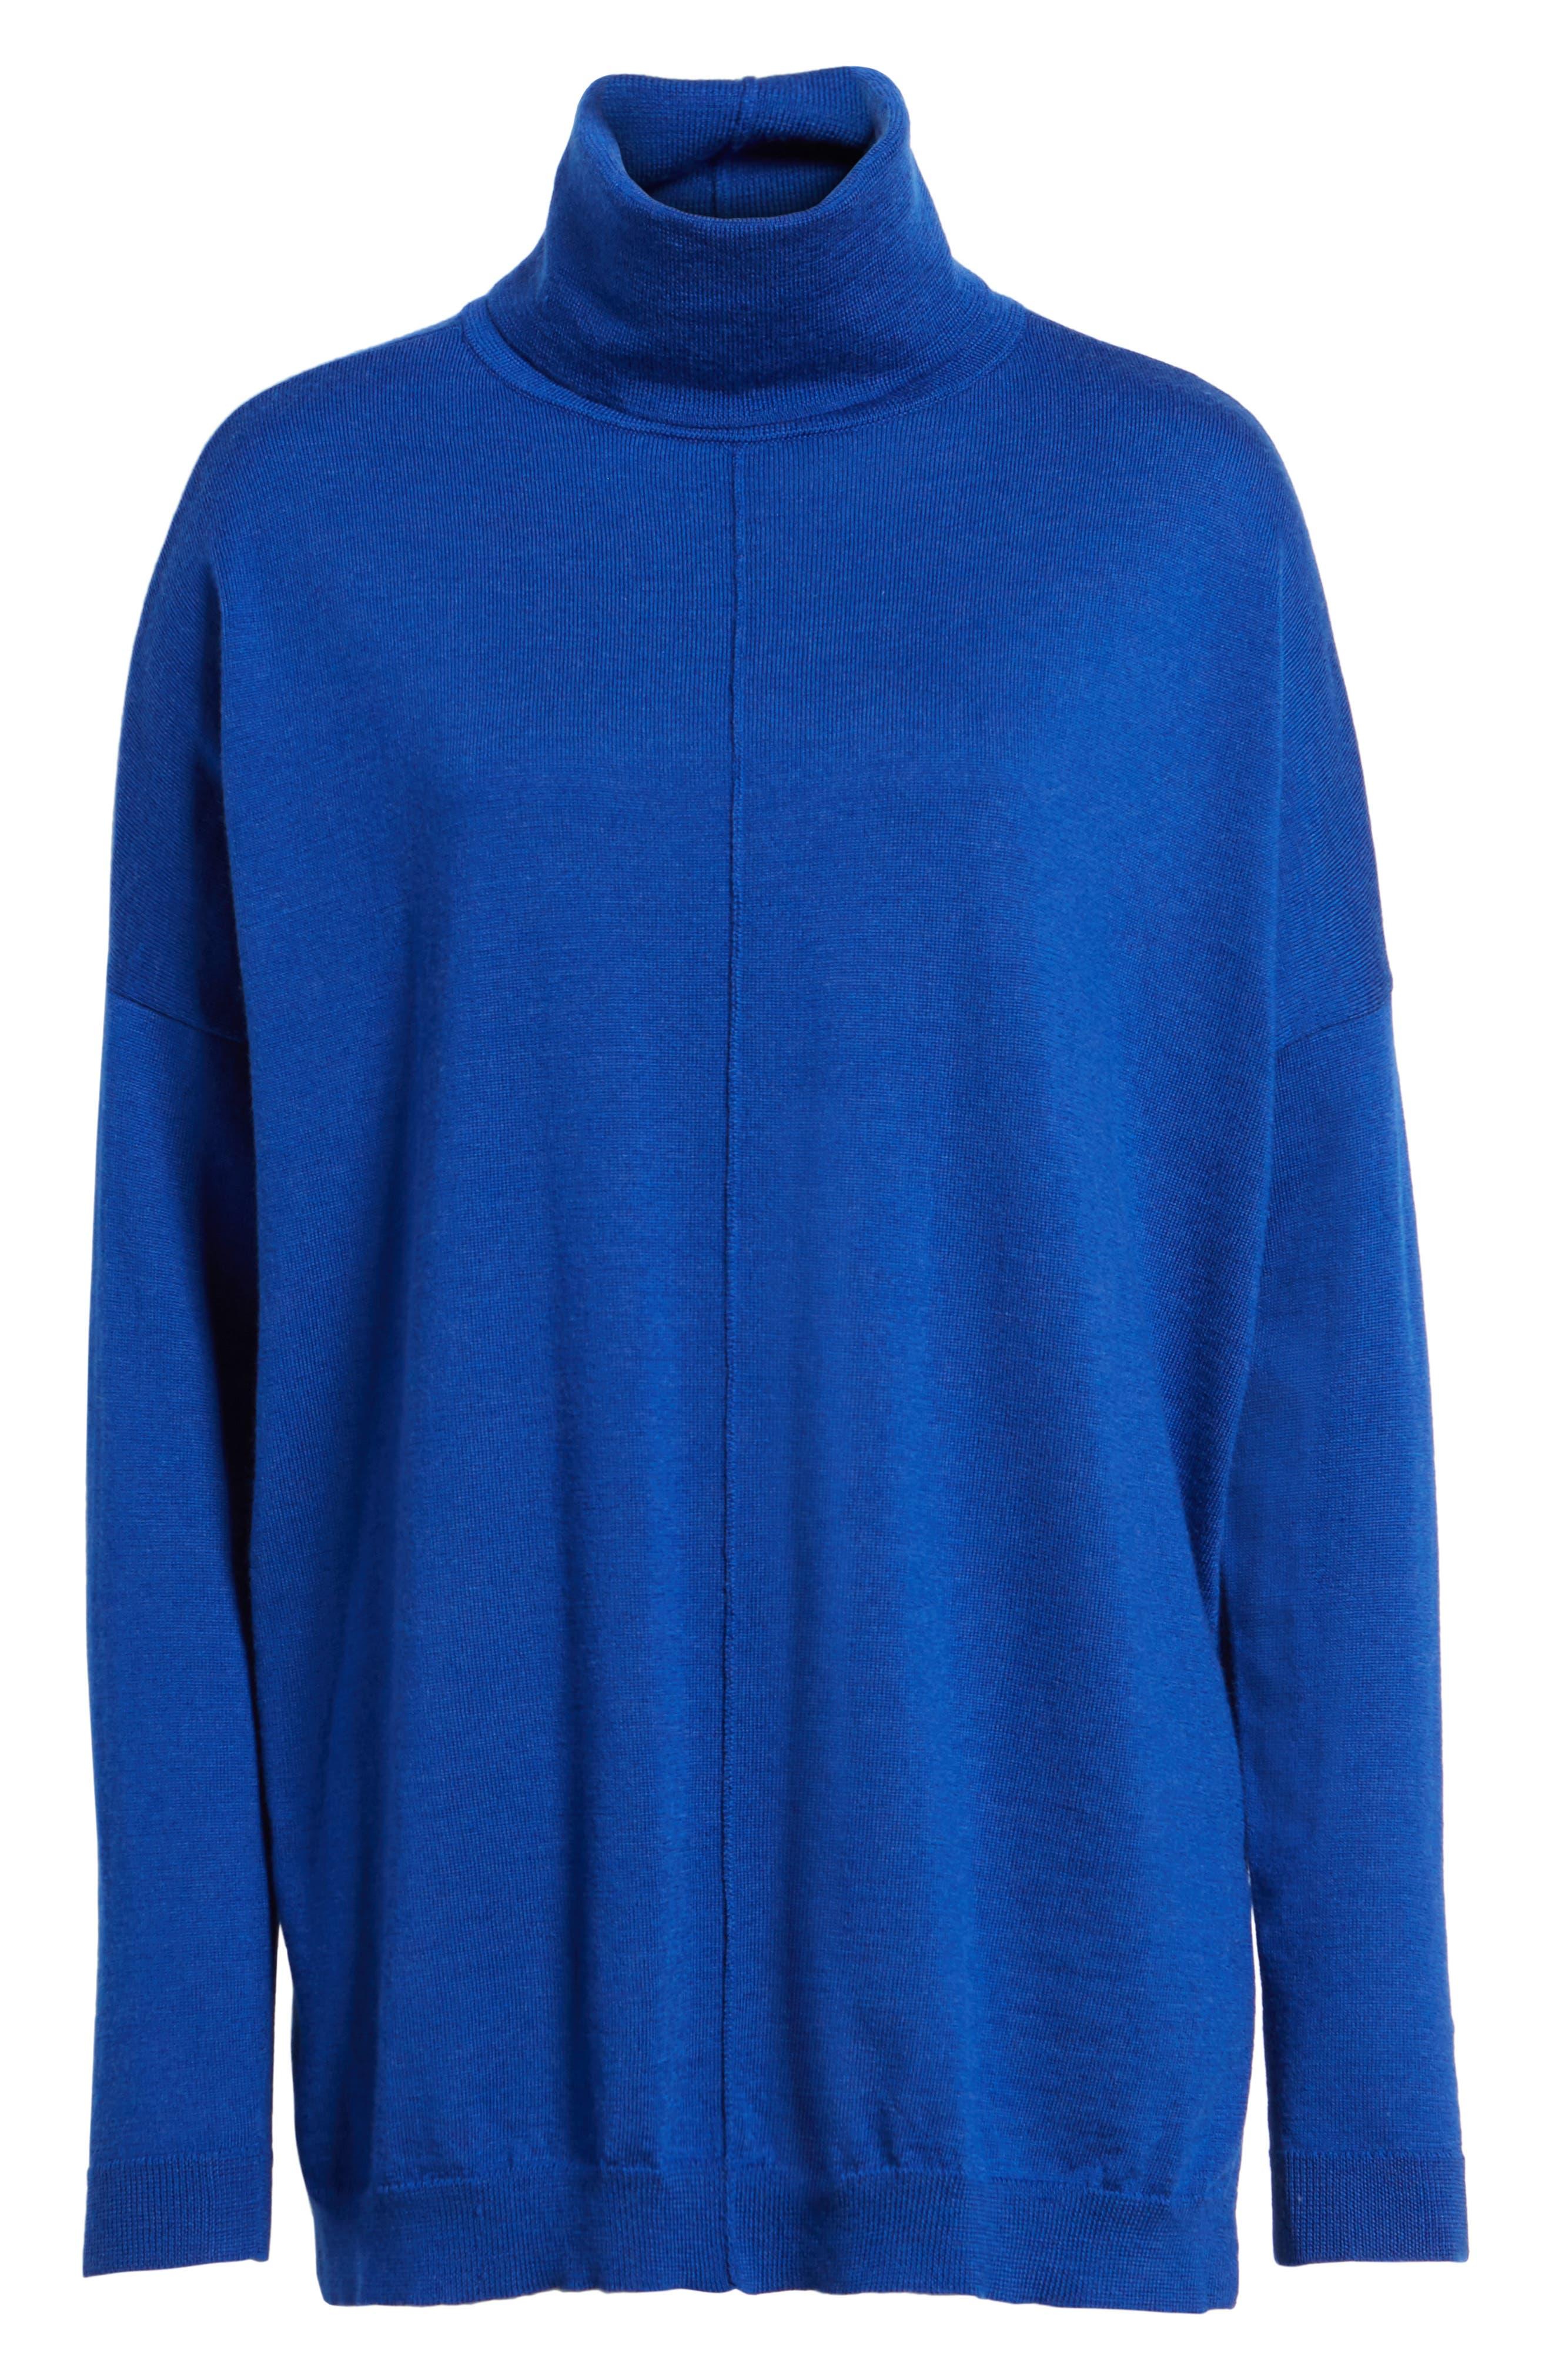 Merino Wool Boxy Turtleneck Sweater,                             Alternate thumbnail 34, color,